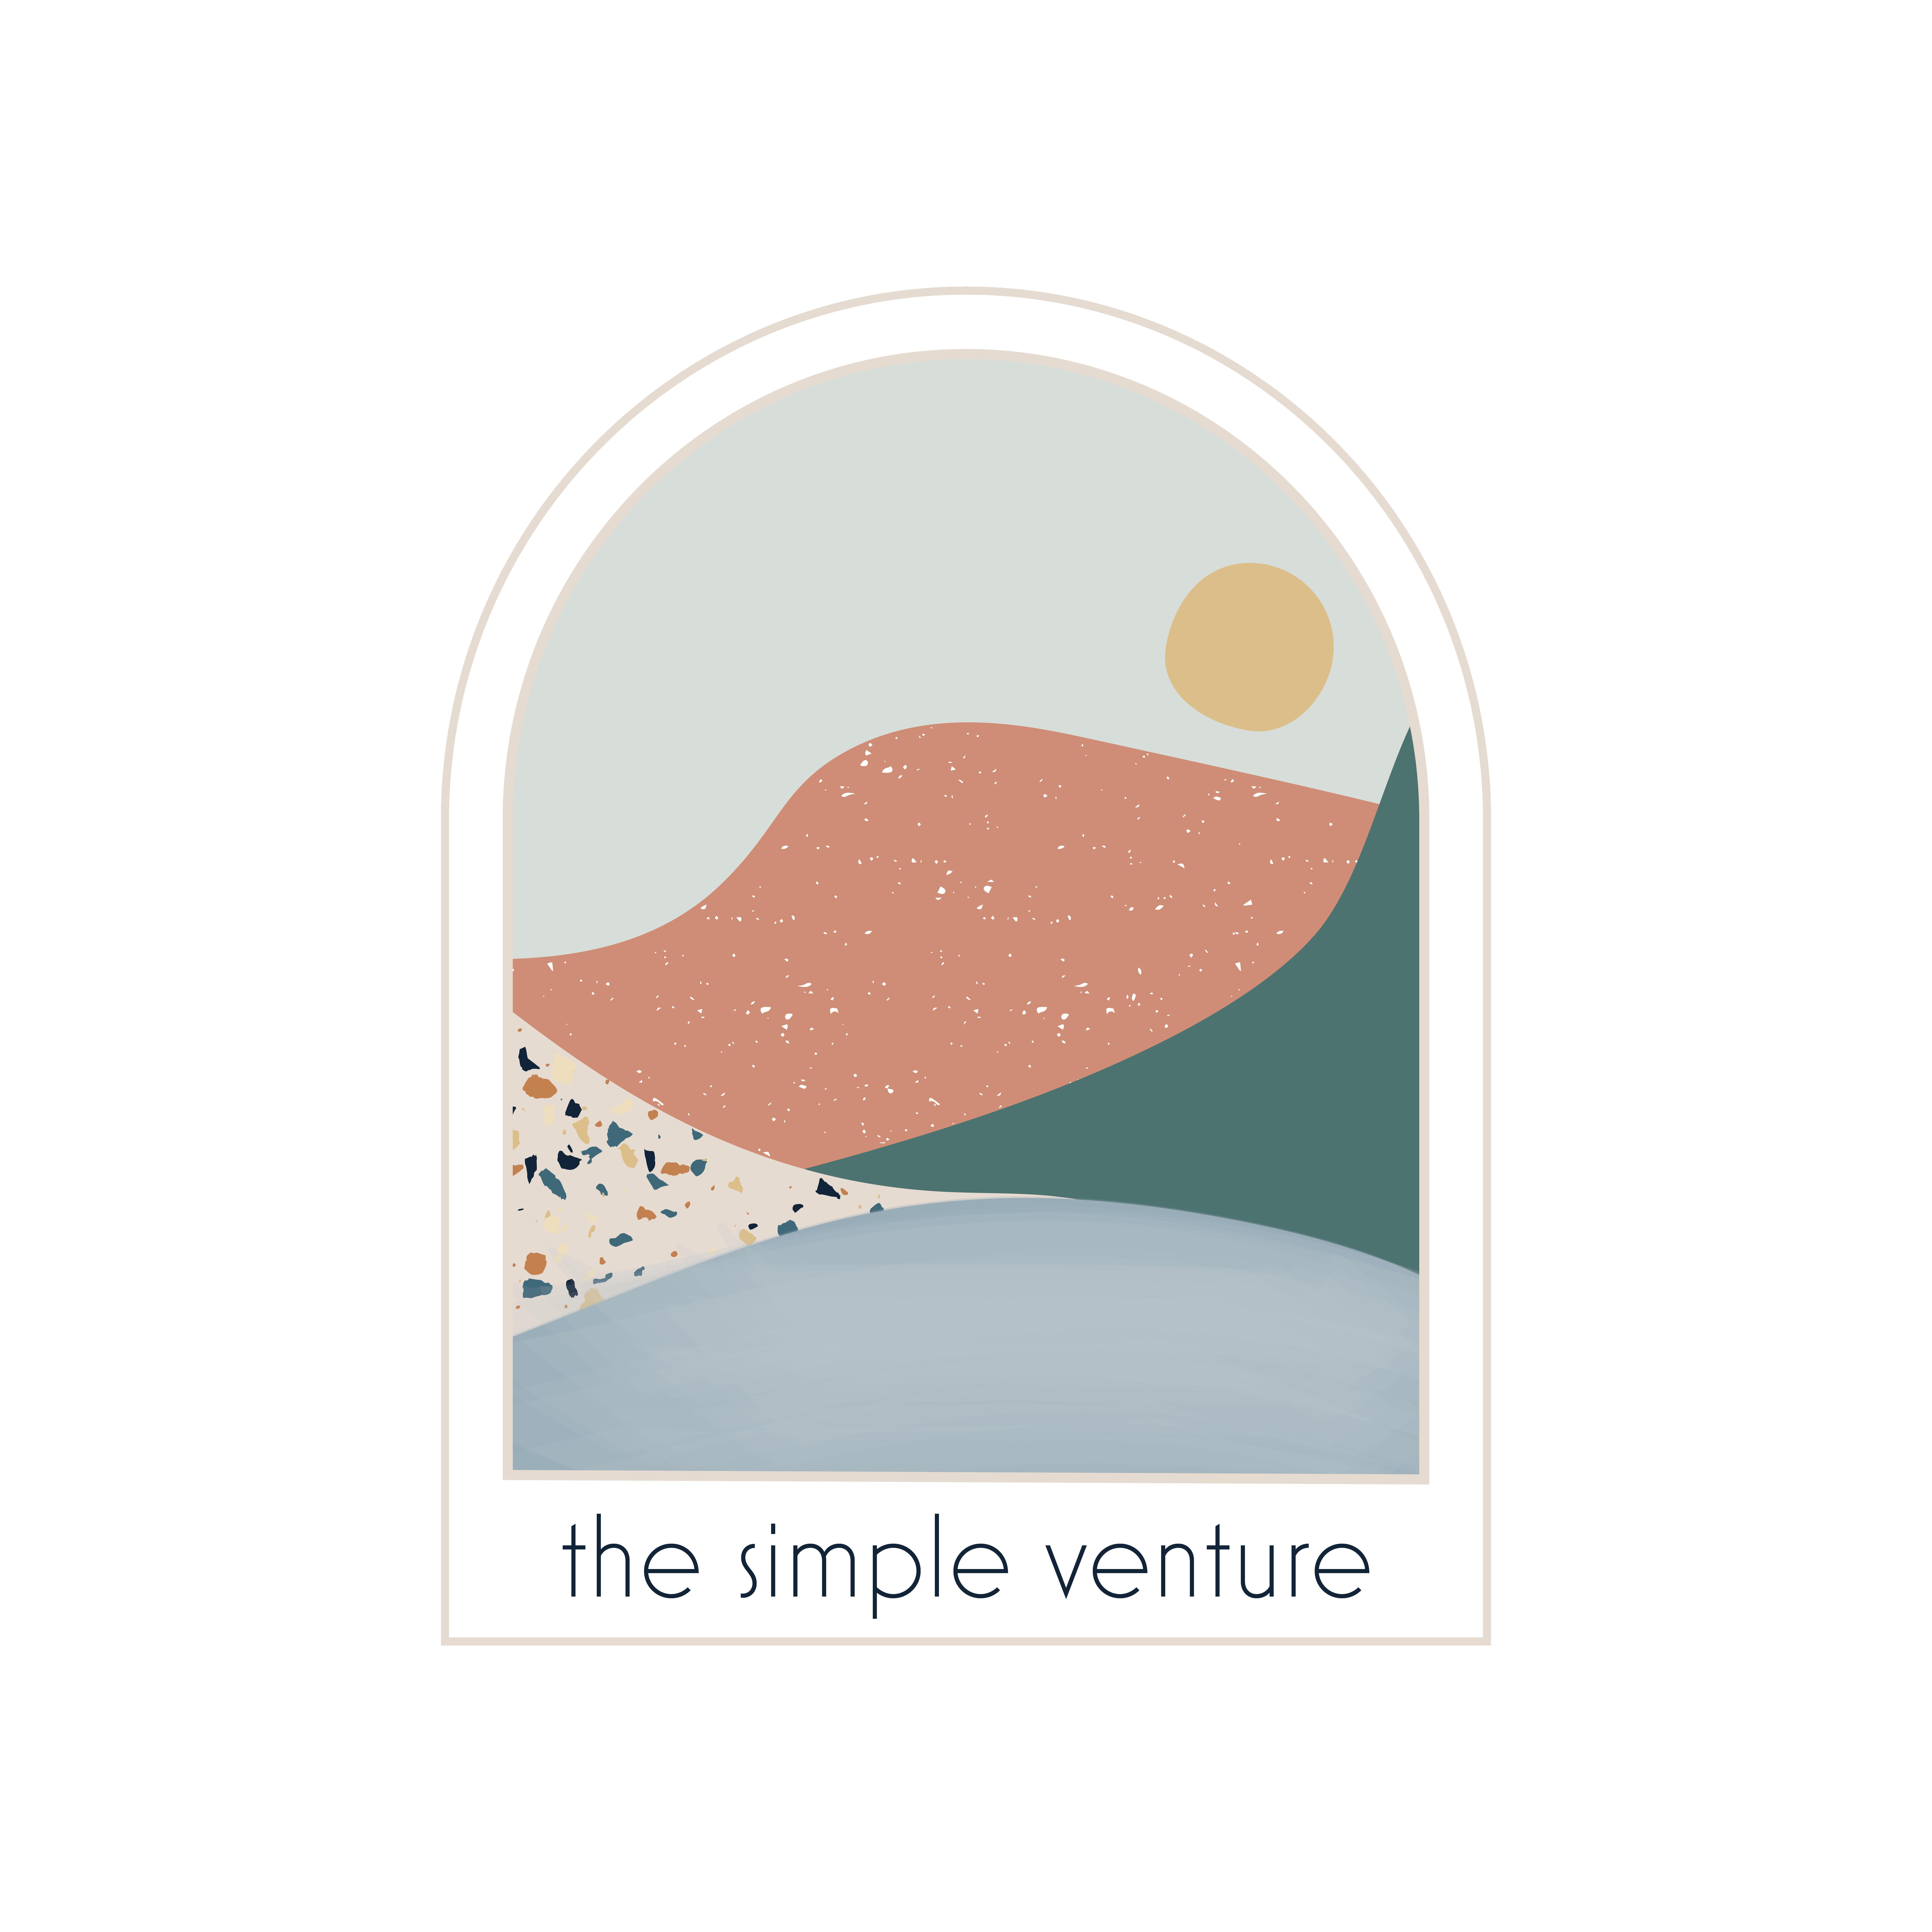 The Simple Venture